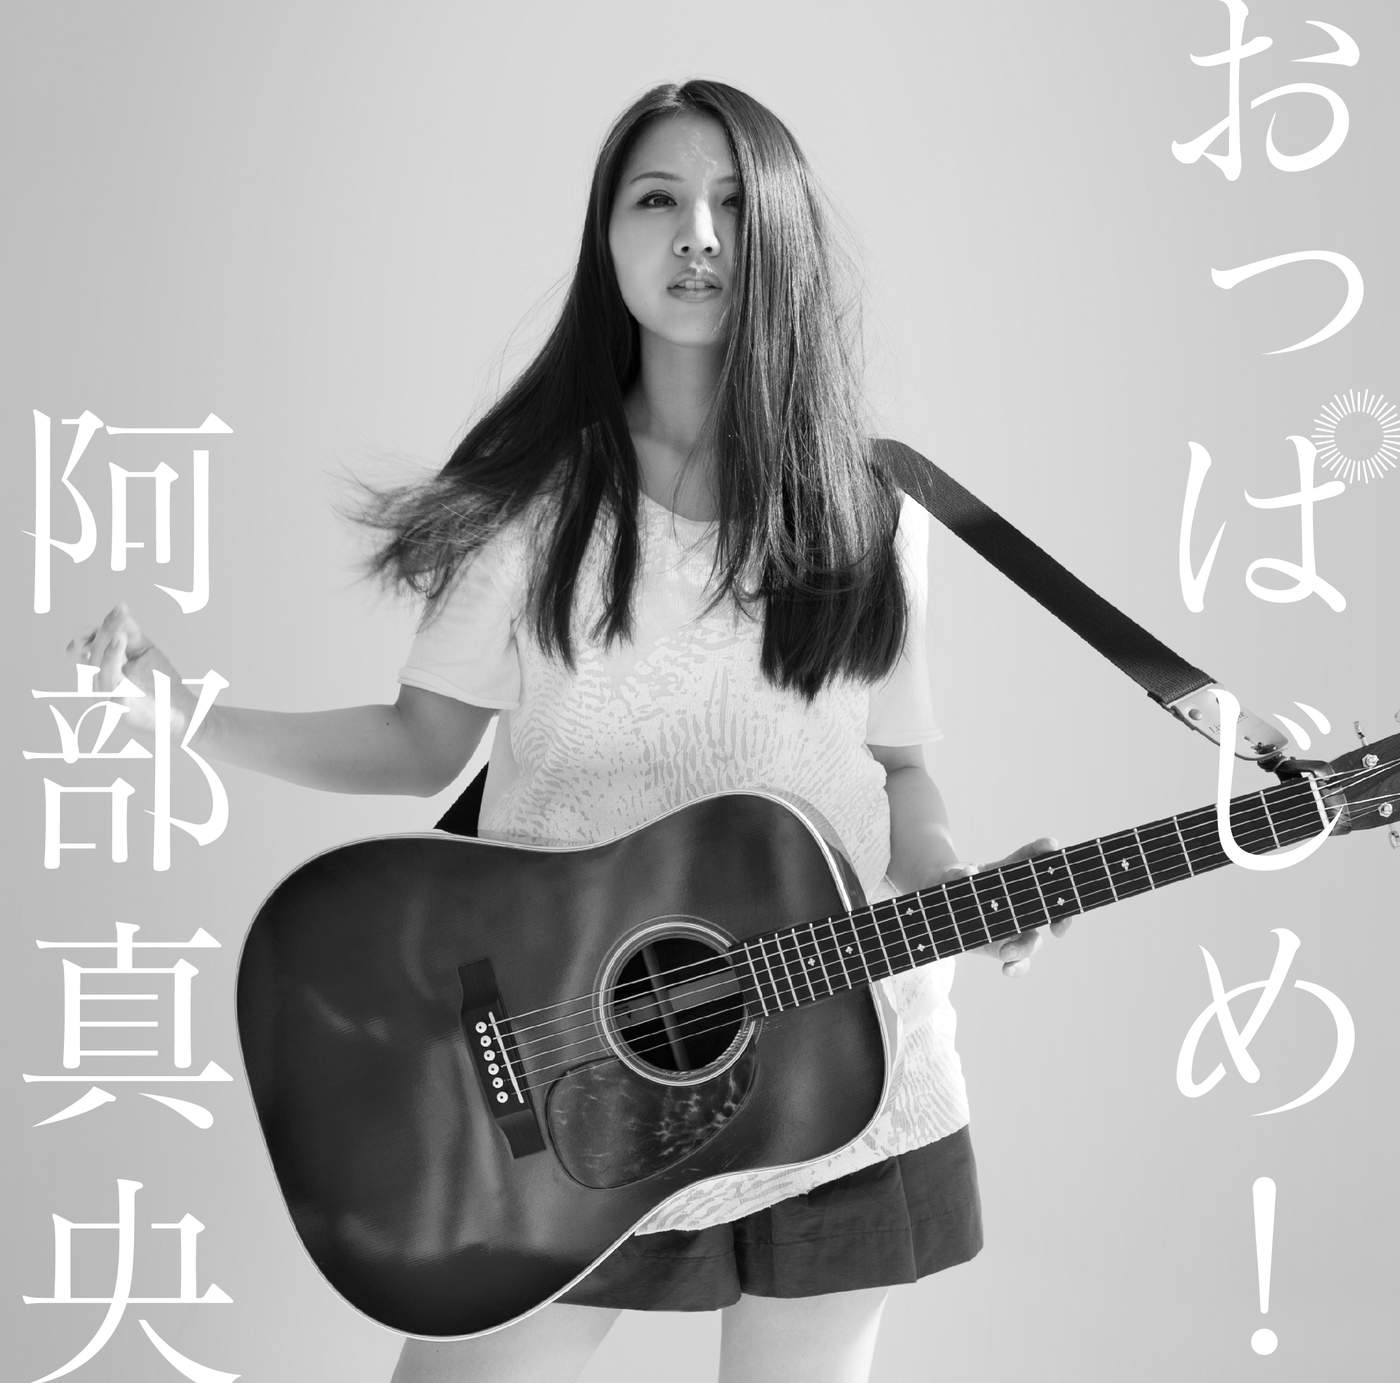 [Album] おっぱじめ! (Oppajime!) - 阿部真央 (Mao Abe)